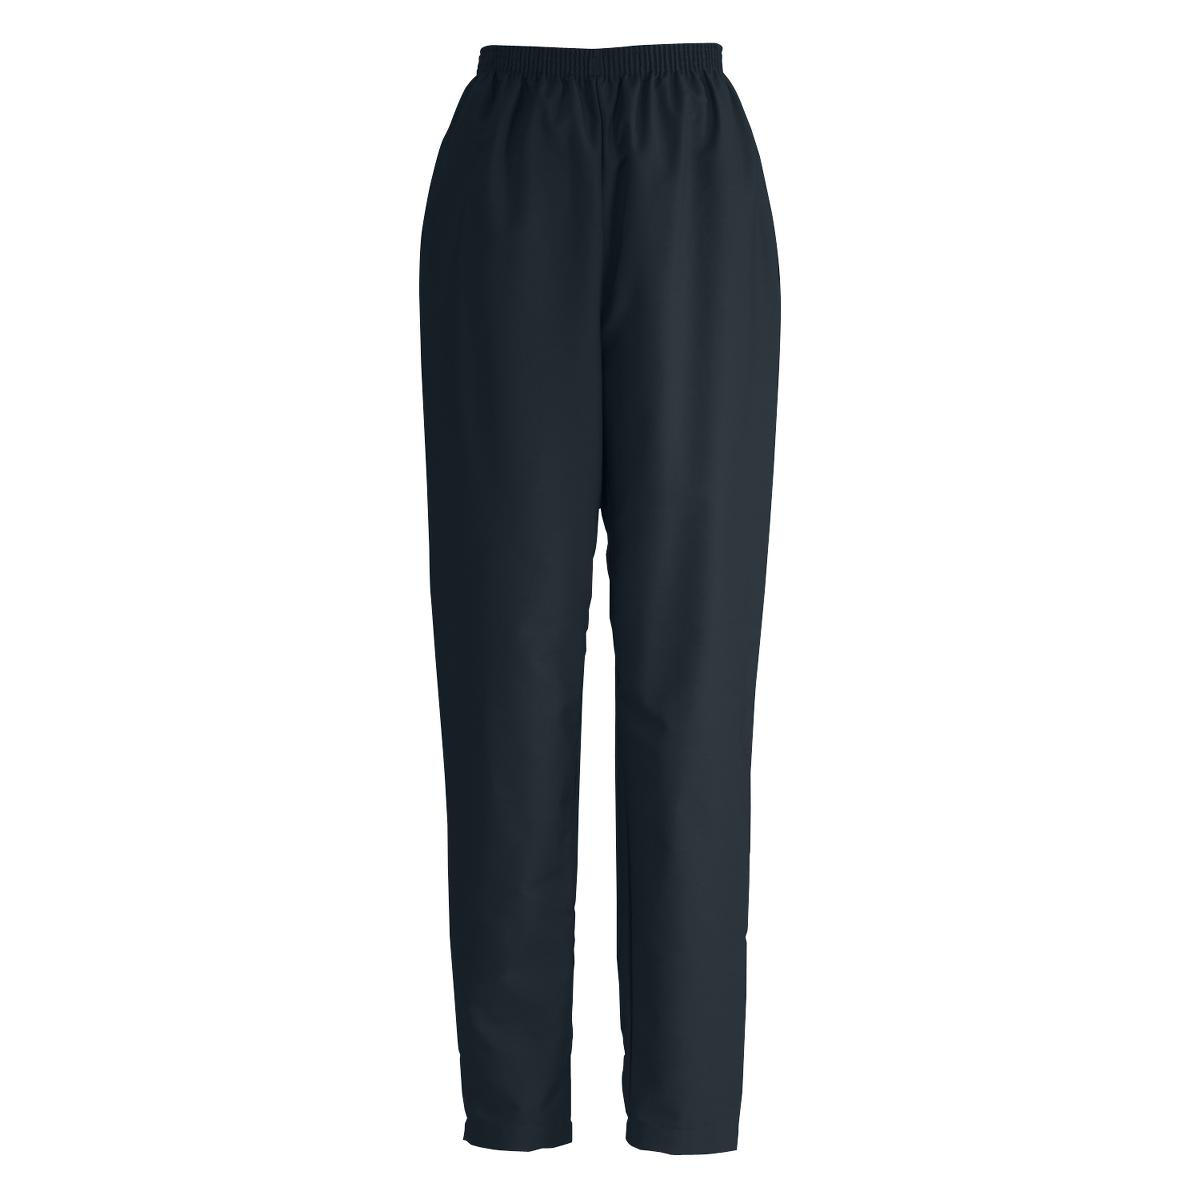 ComfortEase Elastic Waist Two-Pocket Scrub Pants